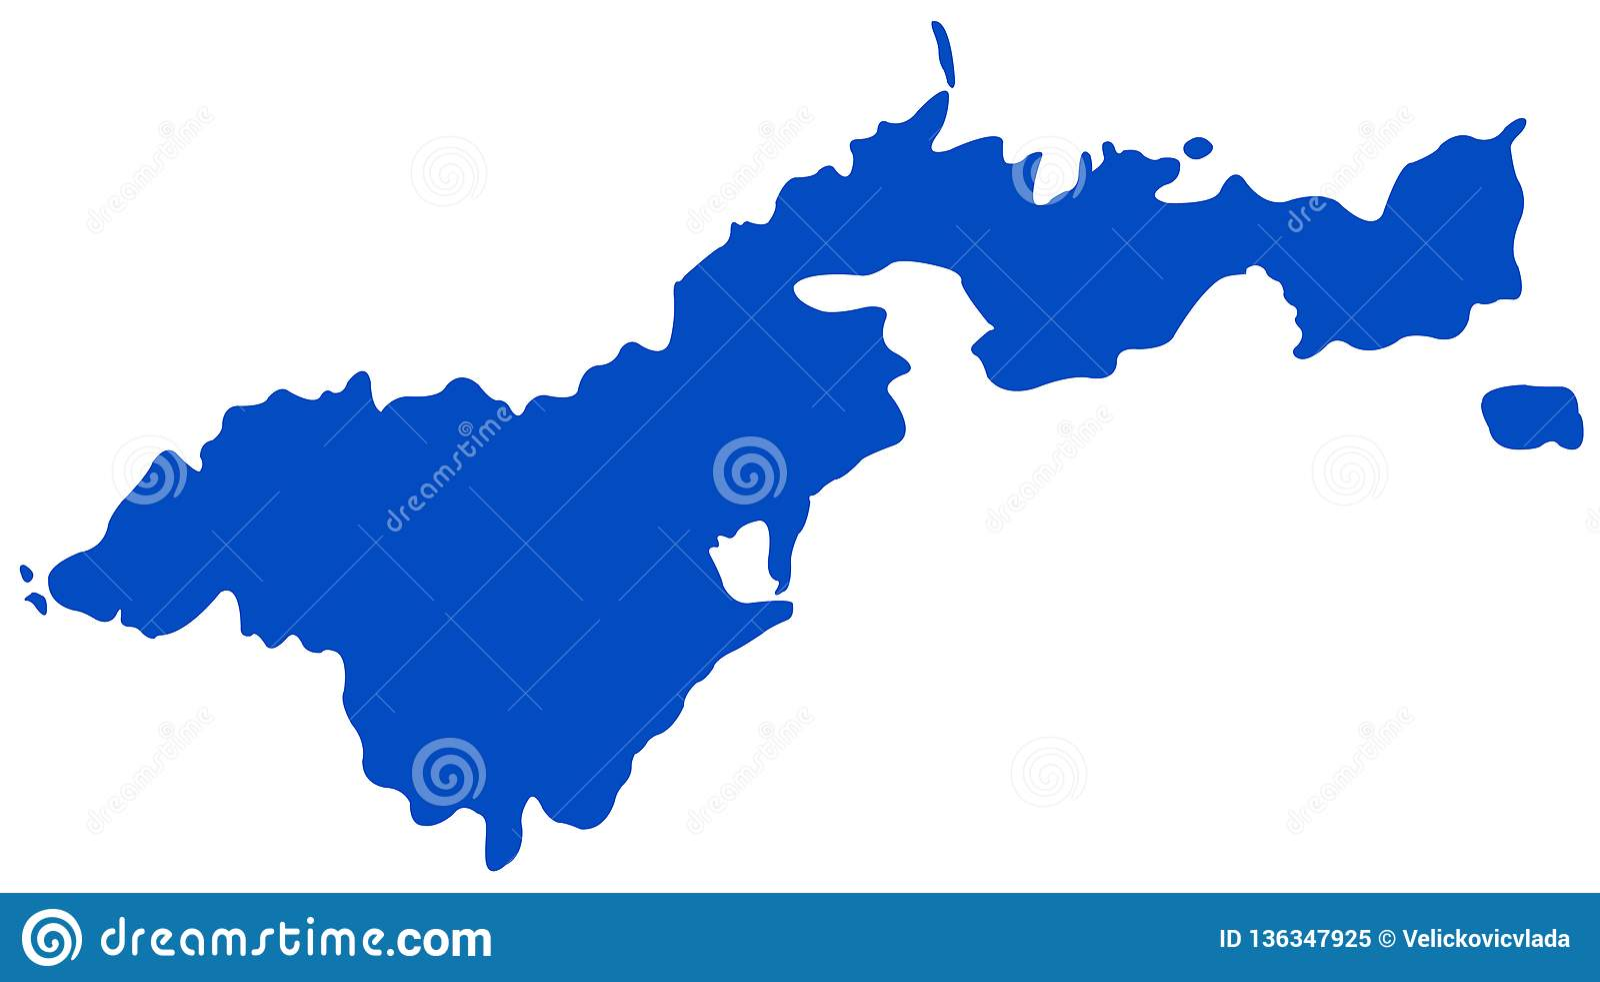 American Samoa Map - Unincorporated Territory Of The United ... on samoa and guam on map, nile river on world map, aegean sea on world map, samoa city, samoa animals, borneo on world map, samoan islands world map, persian gulf on world map, niger river on world map, cayman islands on world map, midway island on world map, yellow river on world map, jarvis island on world map, samoa on a world map, samoa capital, boston location map, honshu on world map, amazon river on world map, lake superior on world map, samoa on the map,